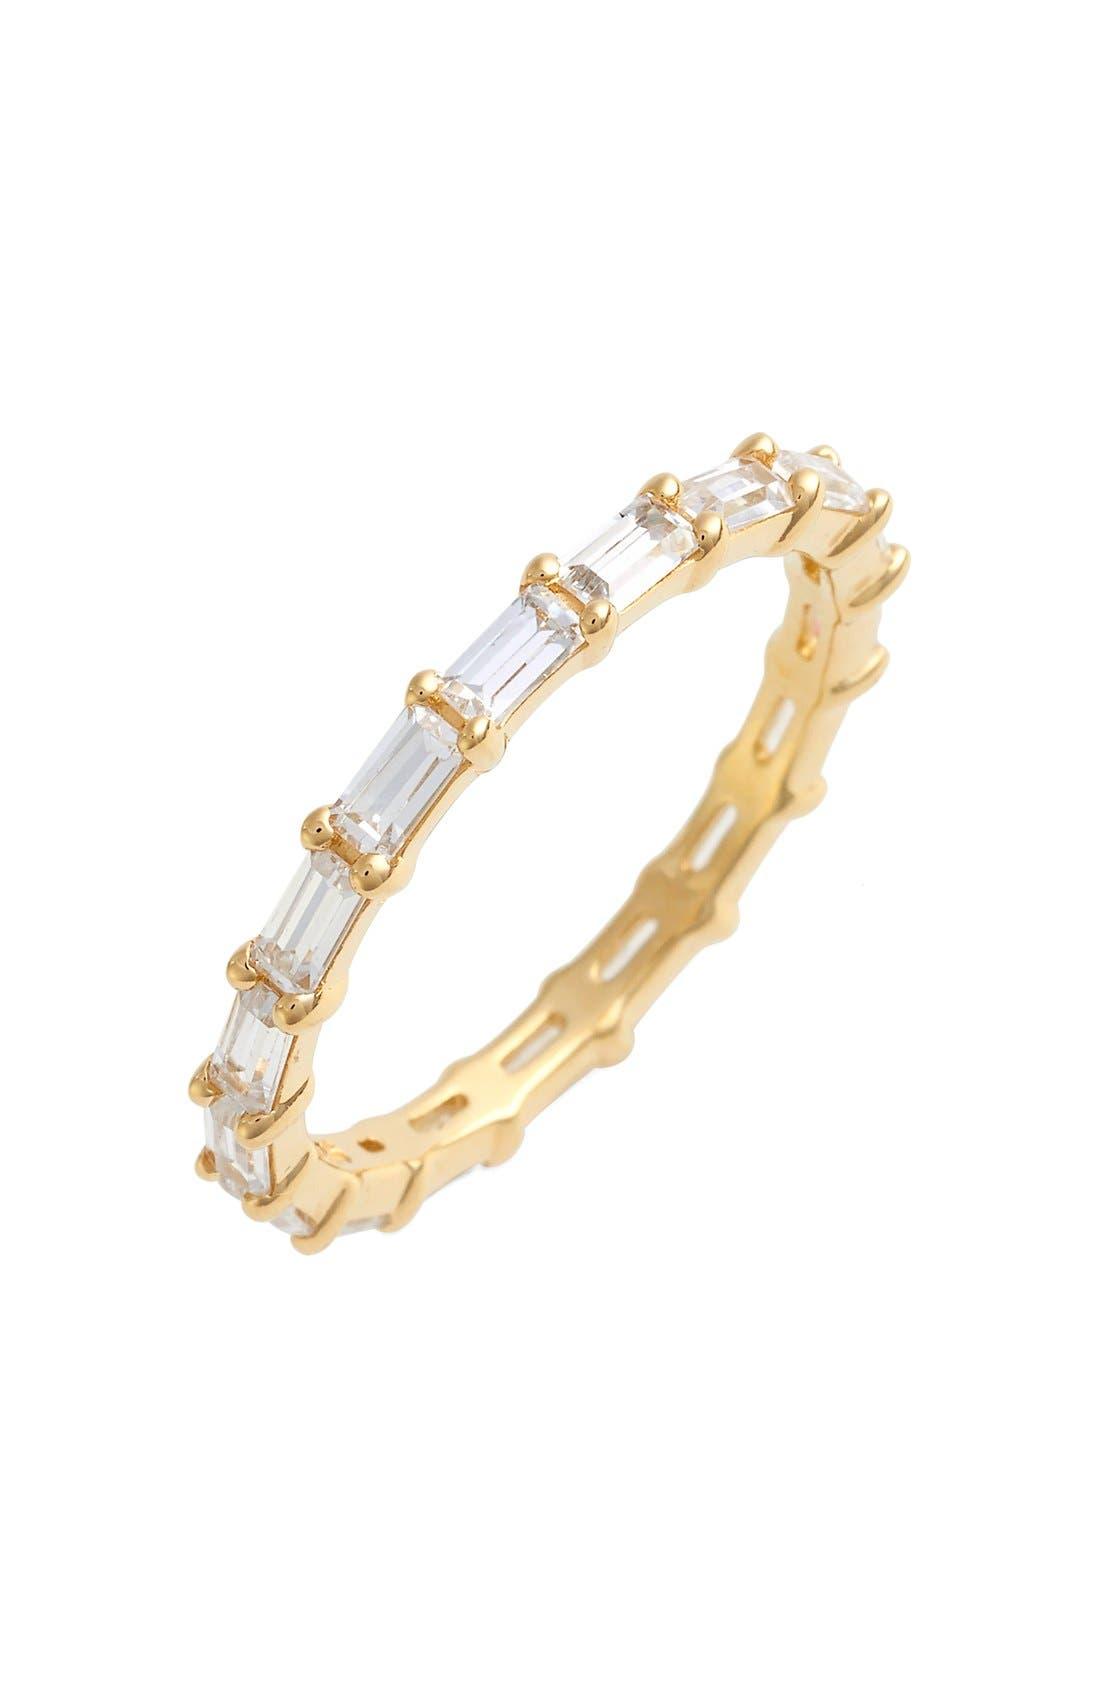 Stackable Cubic Zirconia Baguette Ring,                             Main thumbnail 1, color,                             GOLD